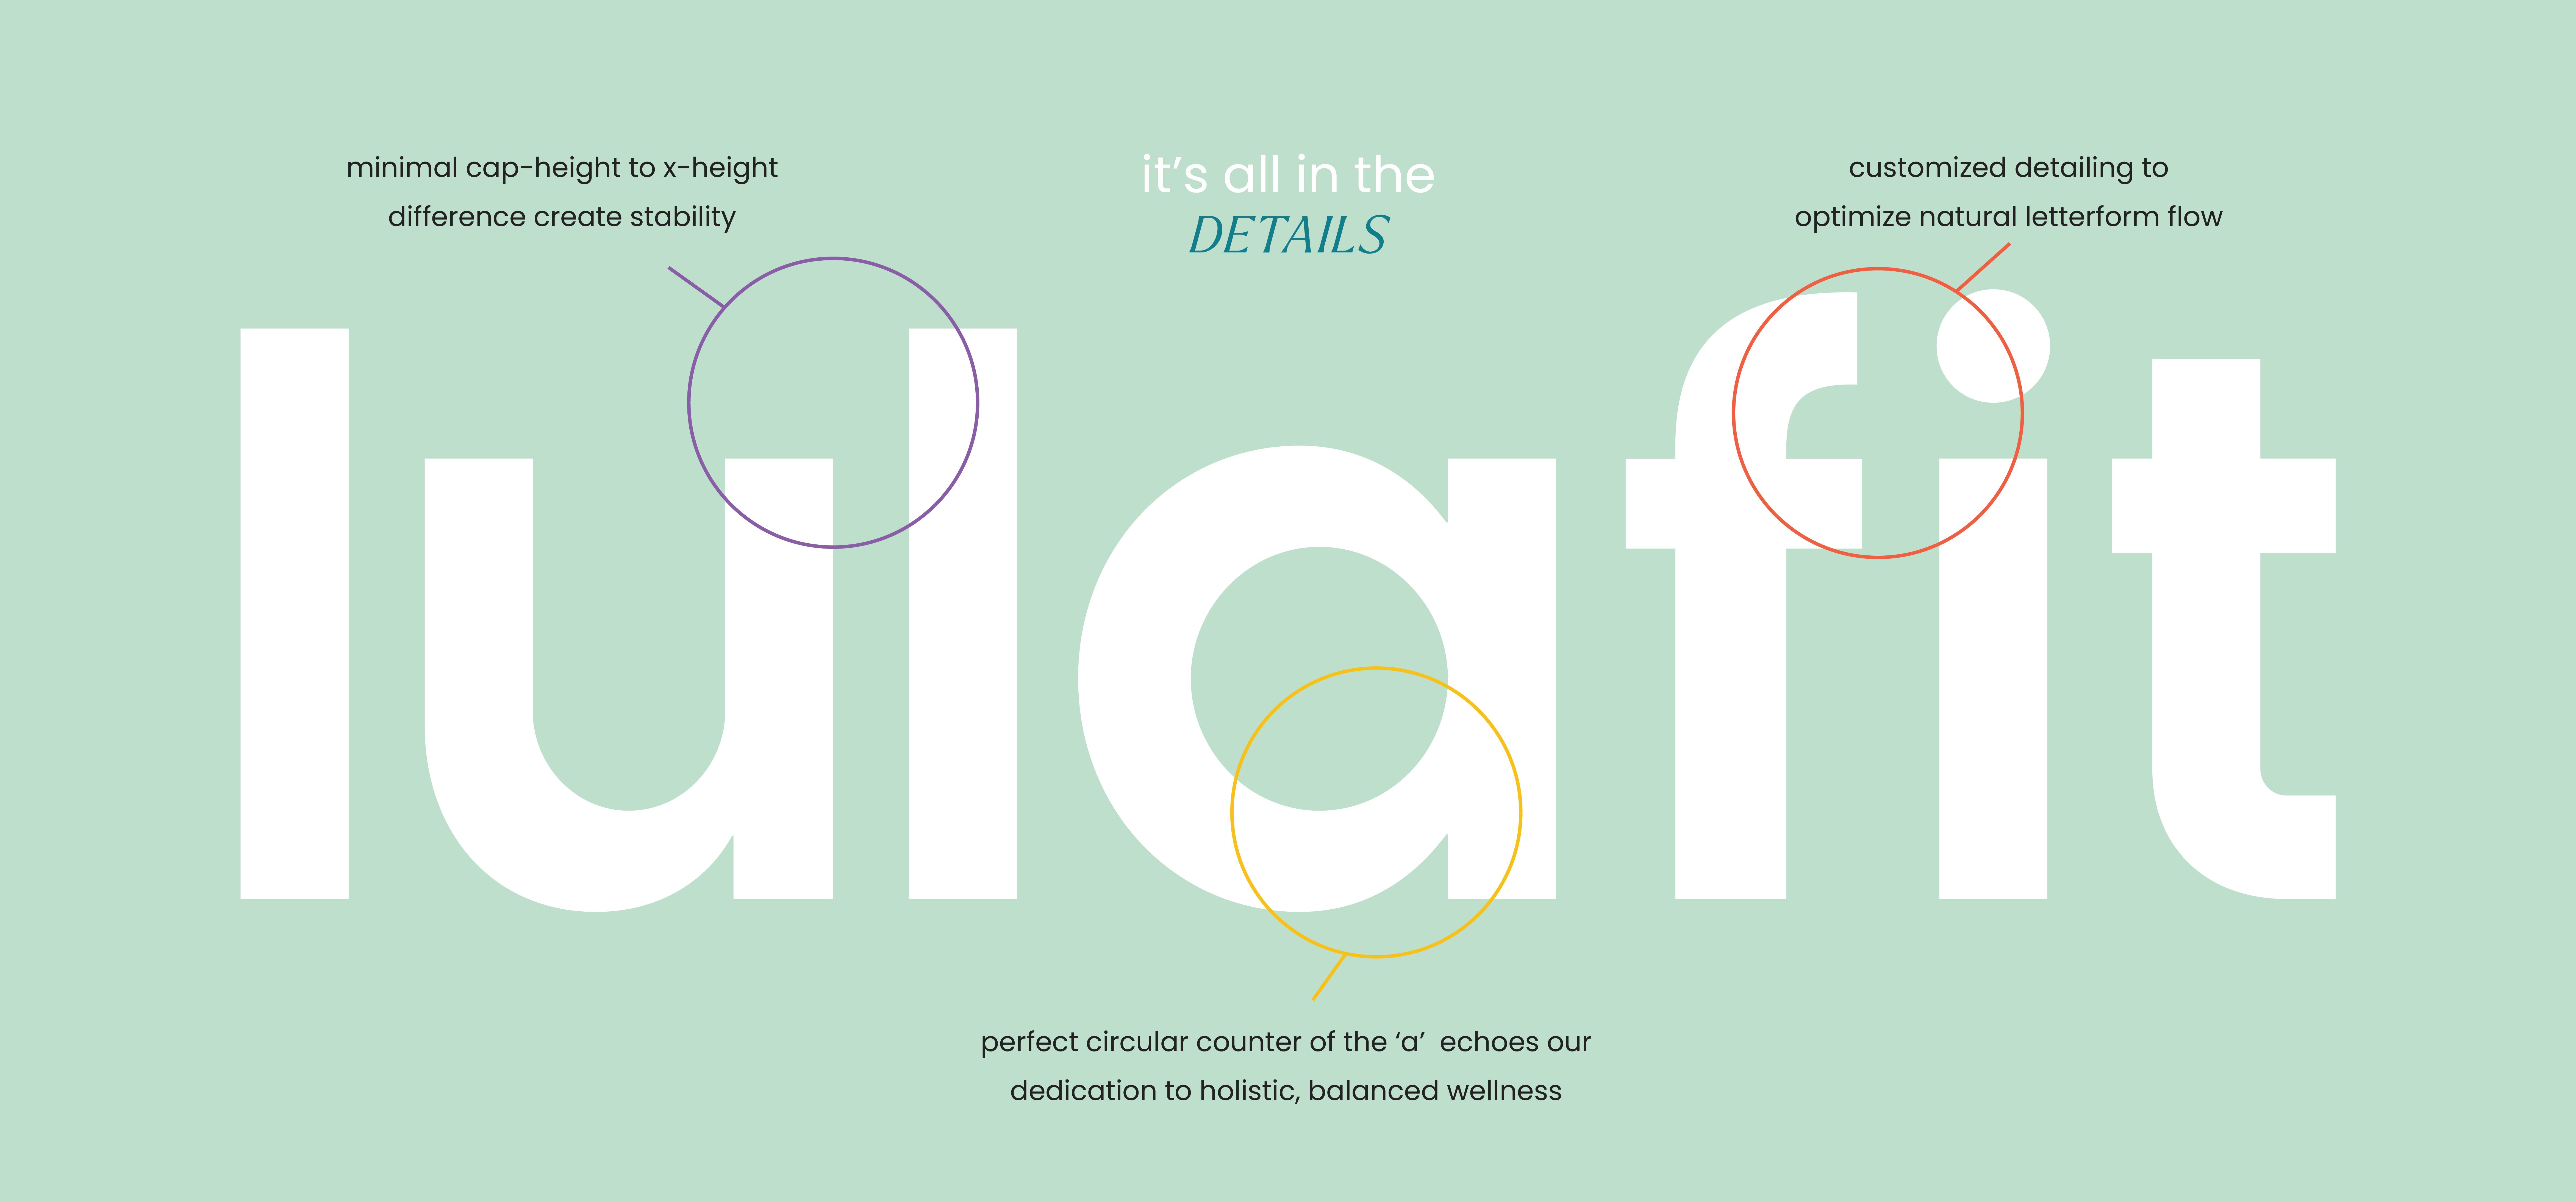 lulafit header image